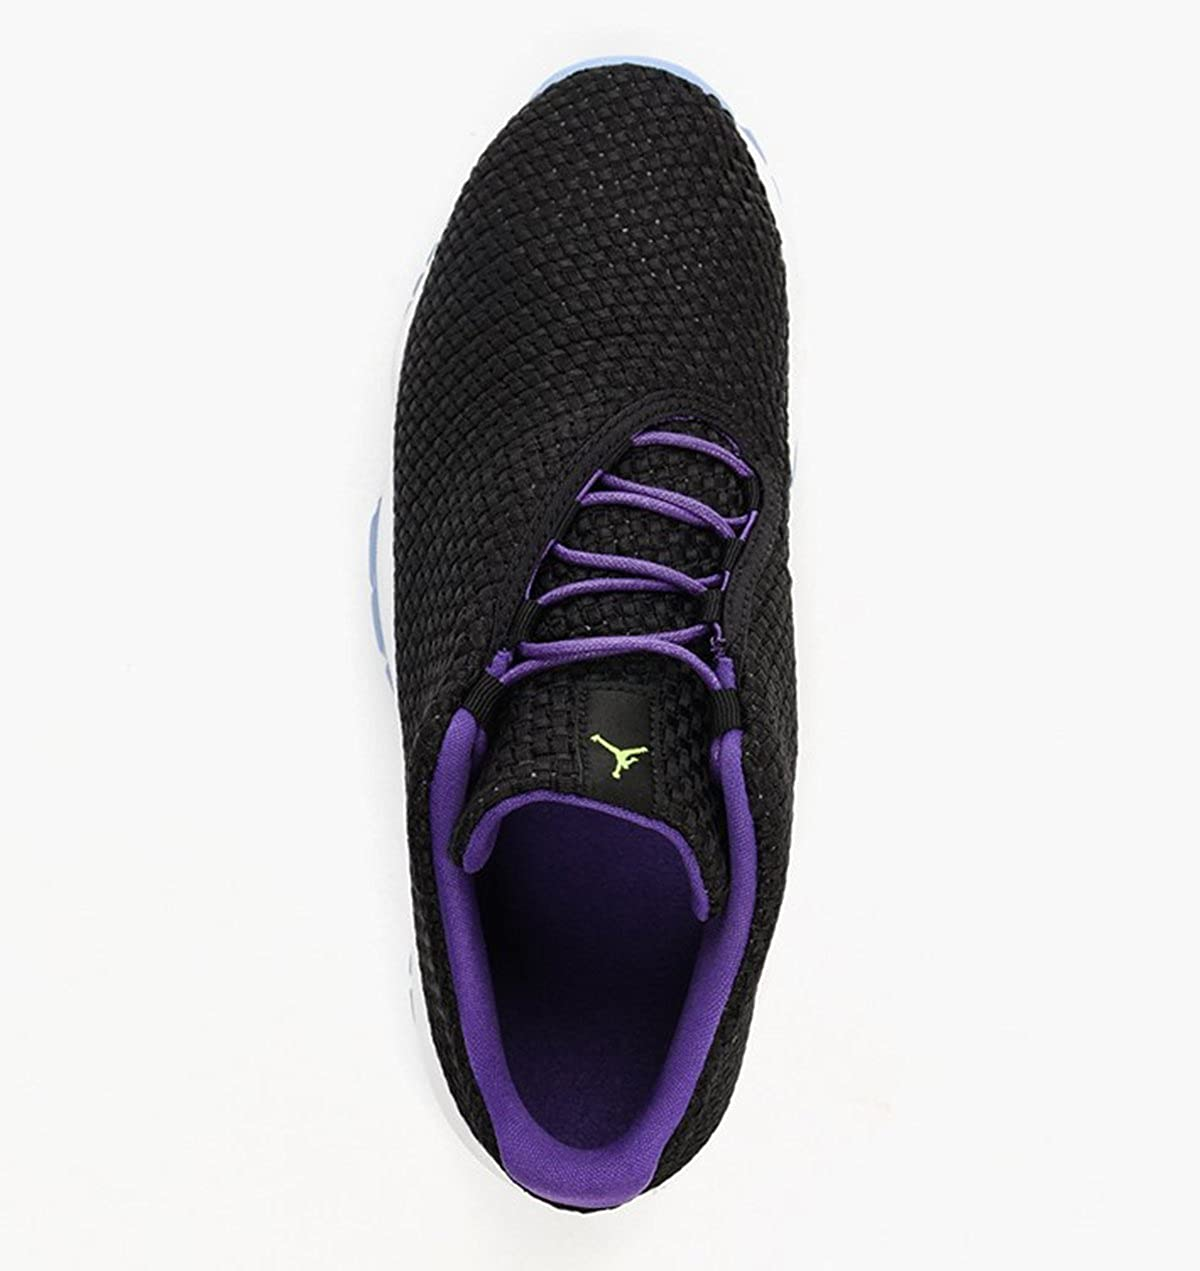 black // ghost green // ultraviolet Jordan Big Kids Future Low GG Size 8 US